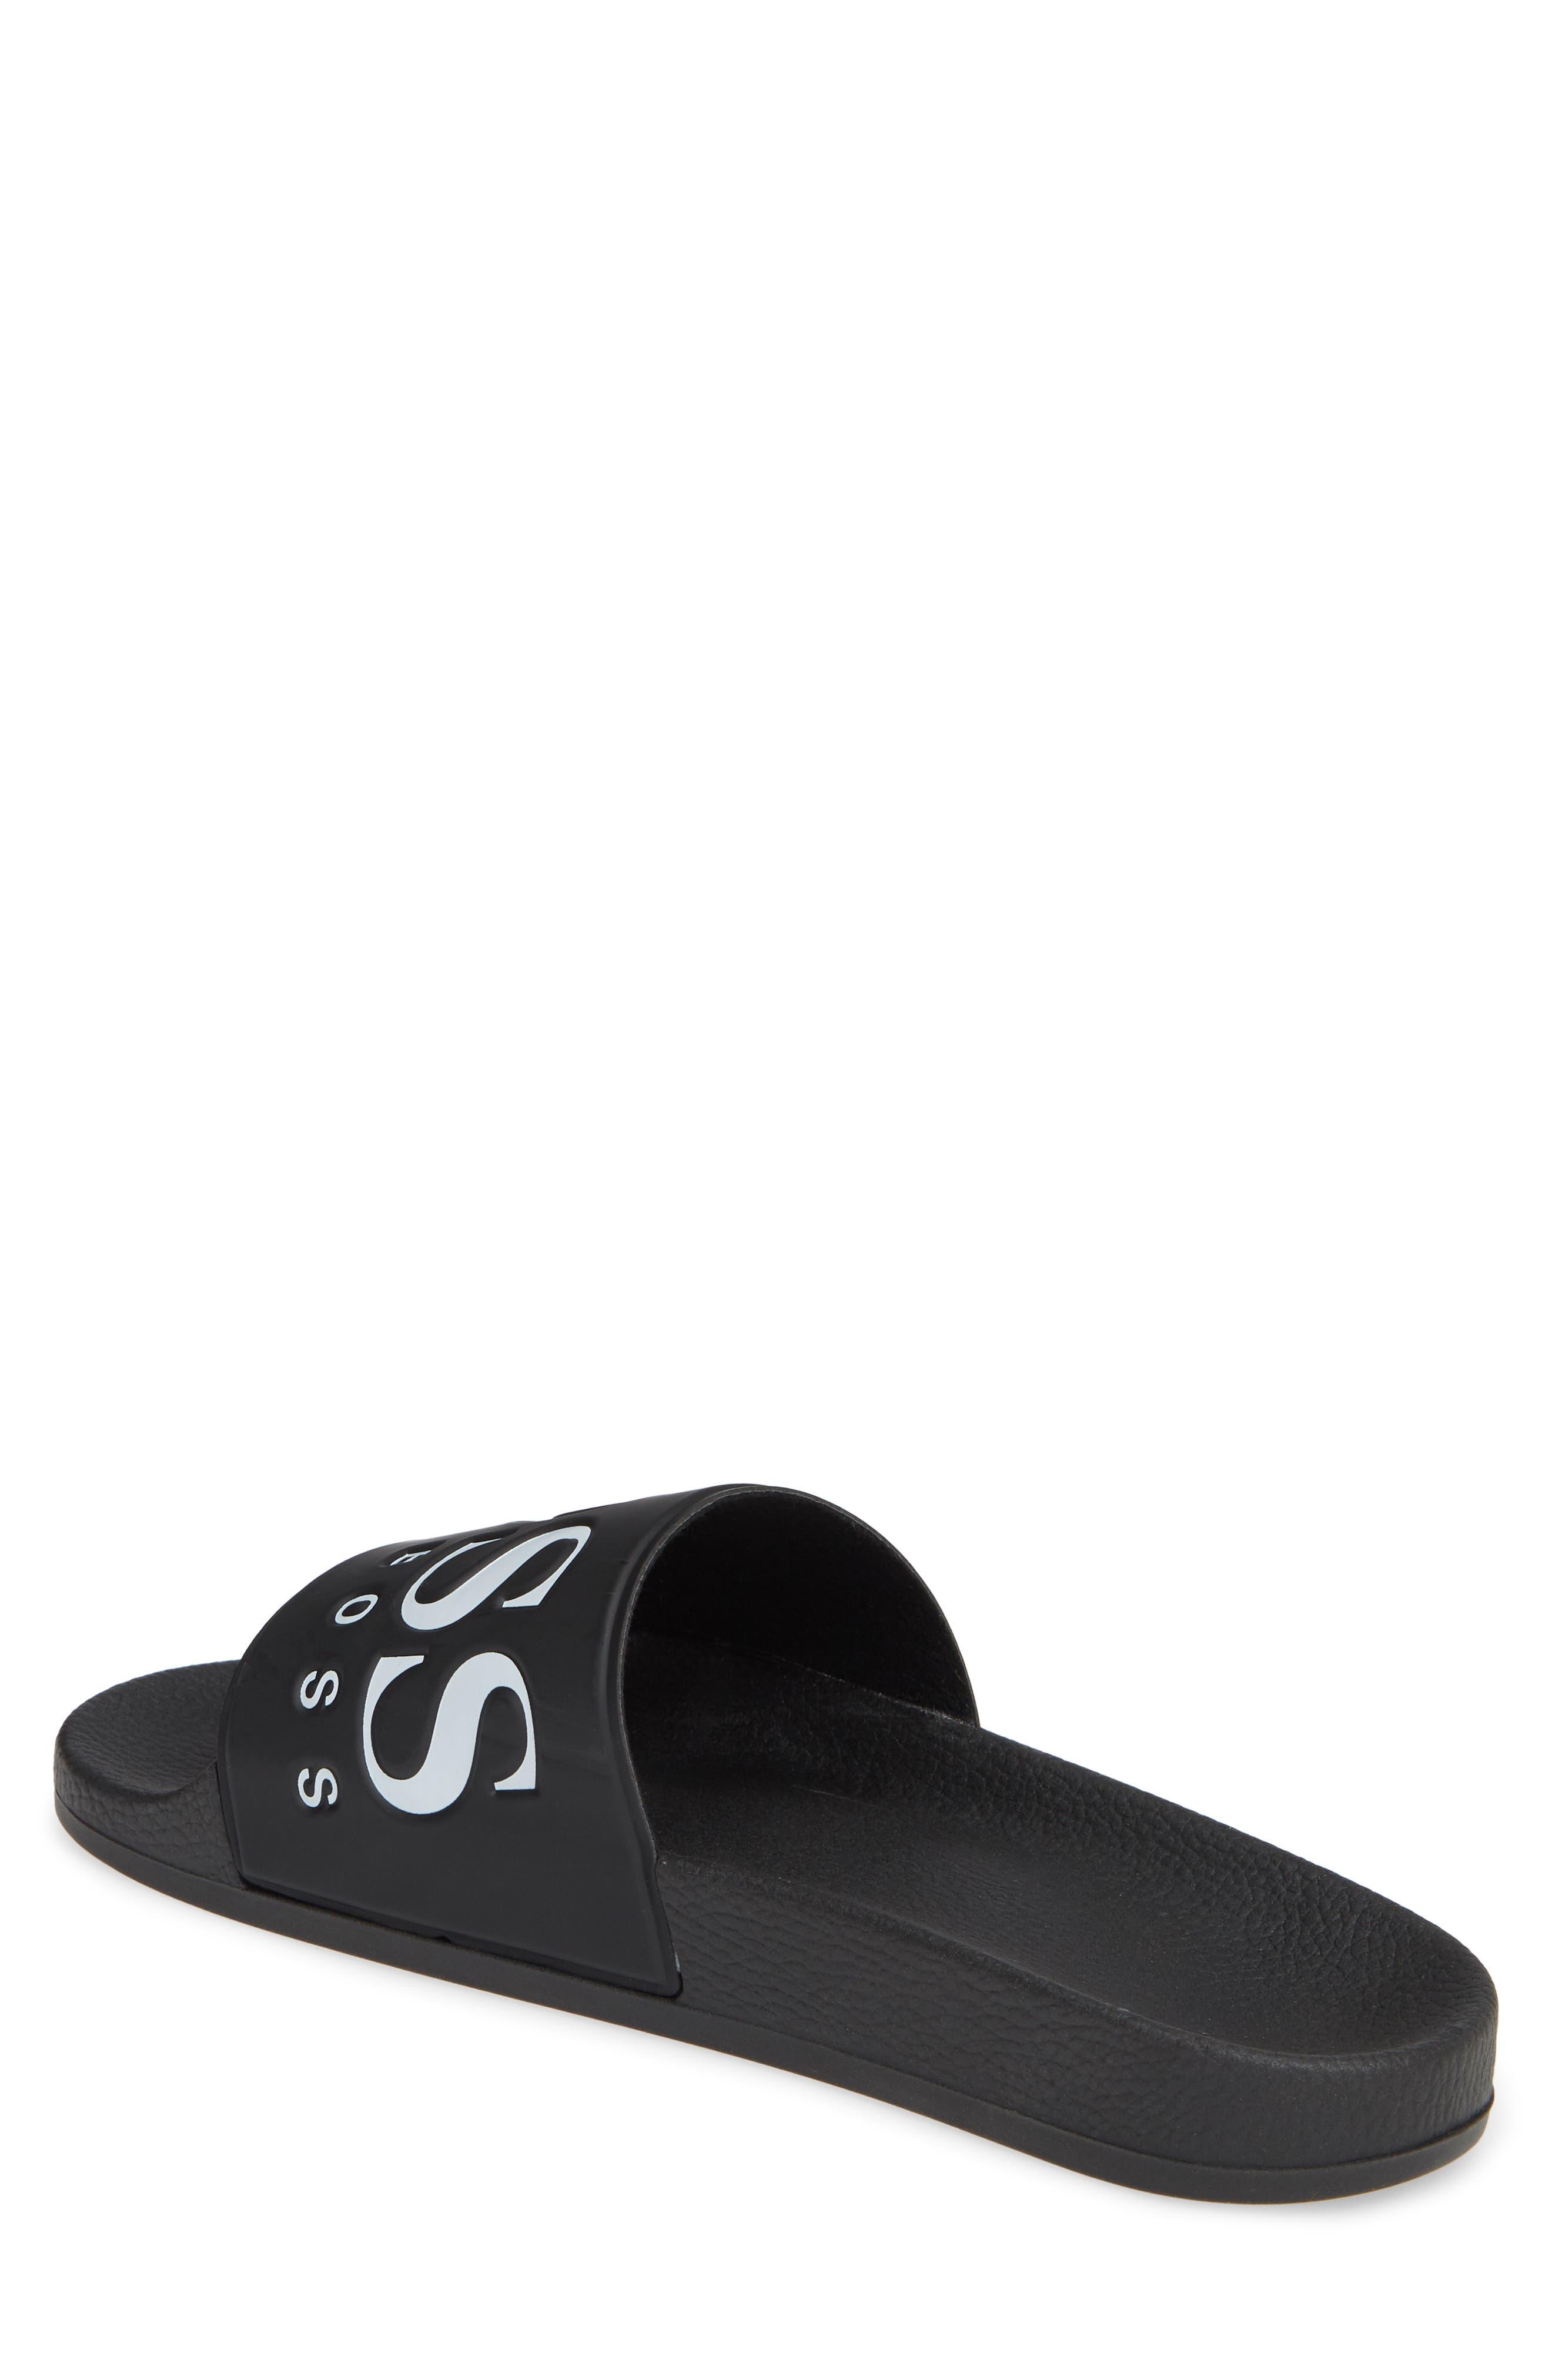 f2a3798bc1f9b Men's BOSS Shoes | Nordstrom